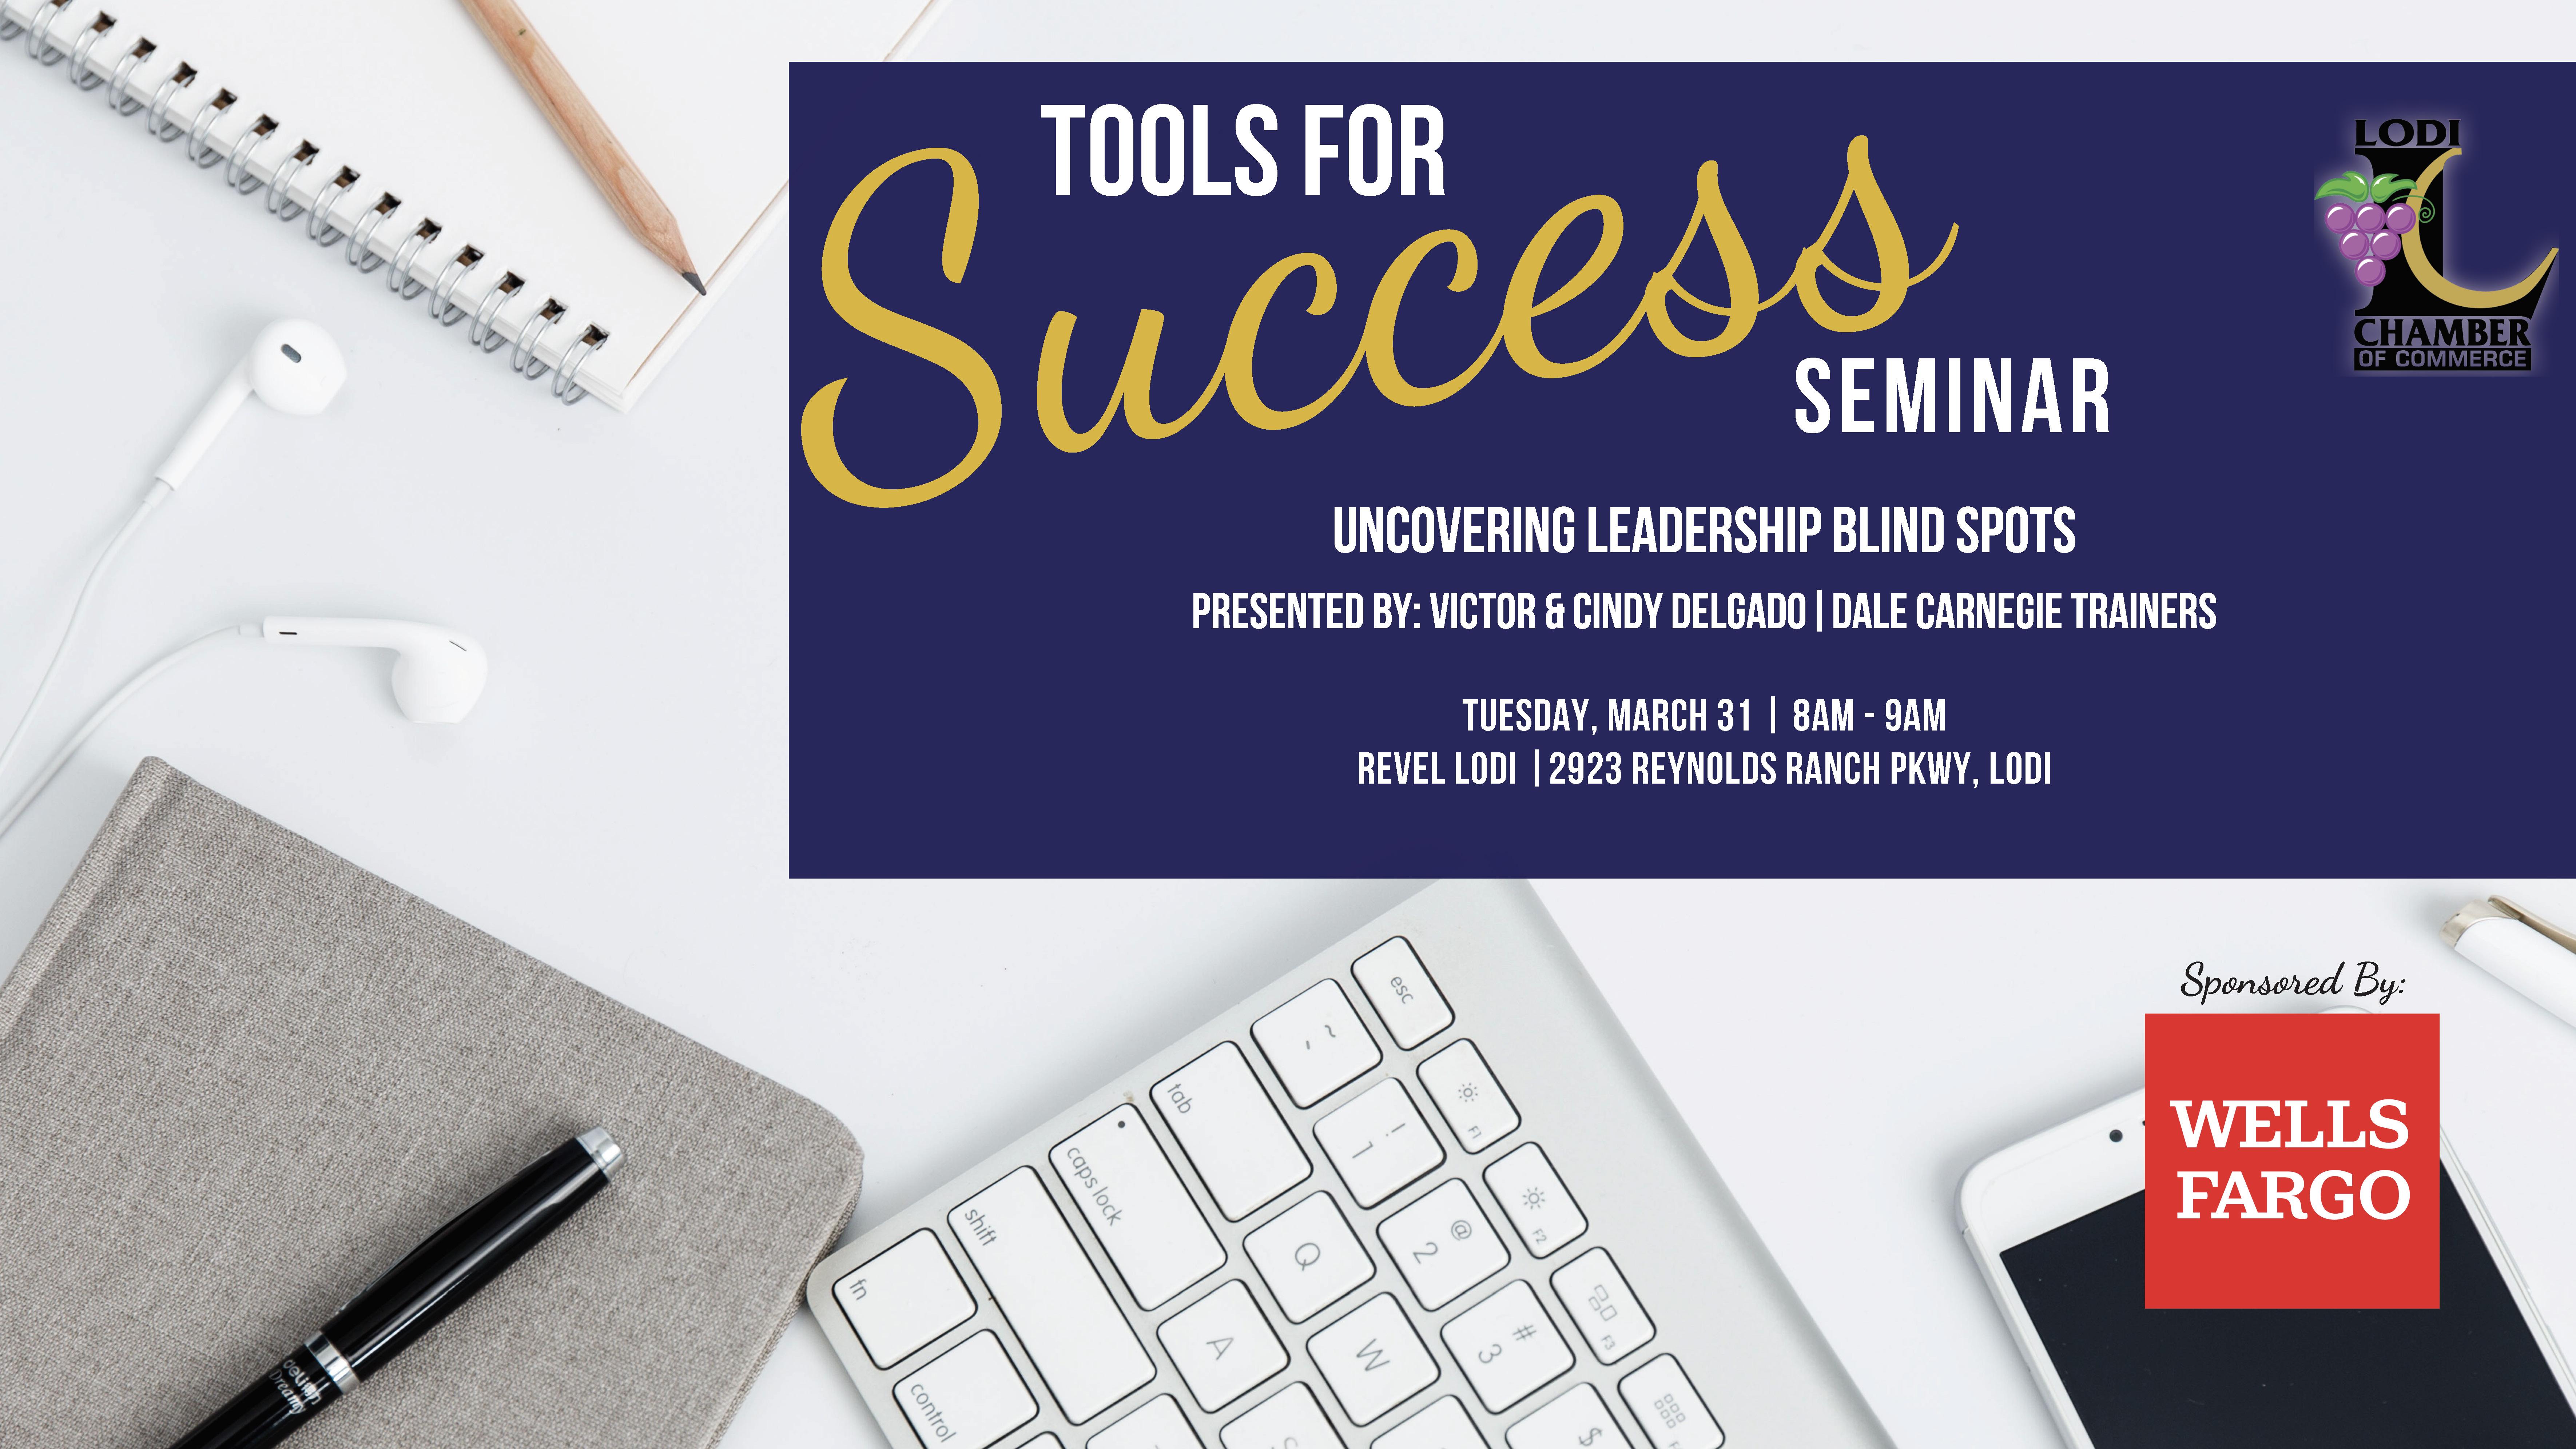 Meet Your Tools for Success Seminar Speakers